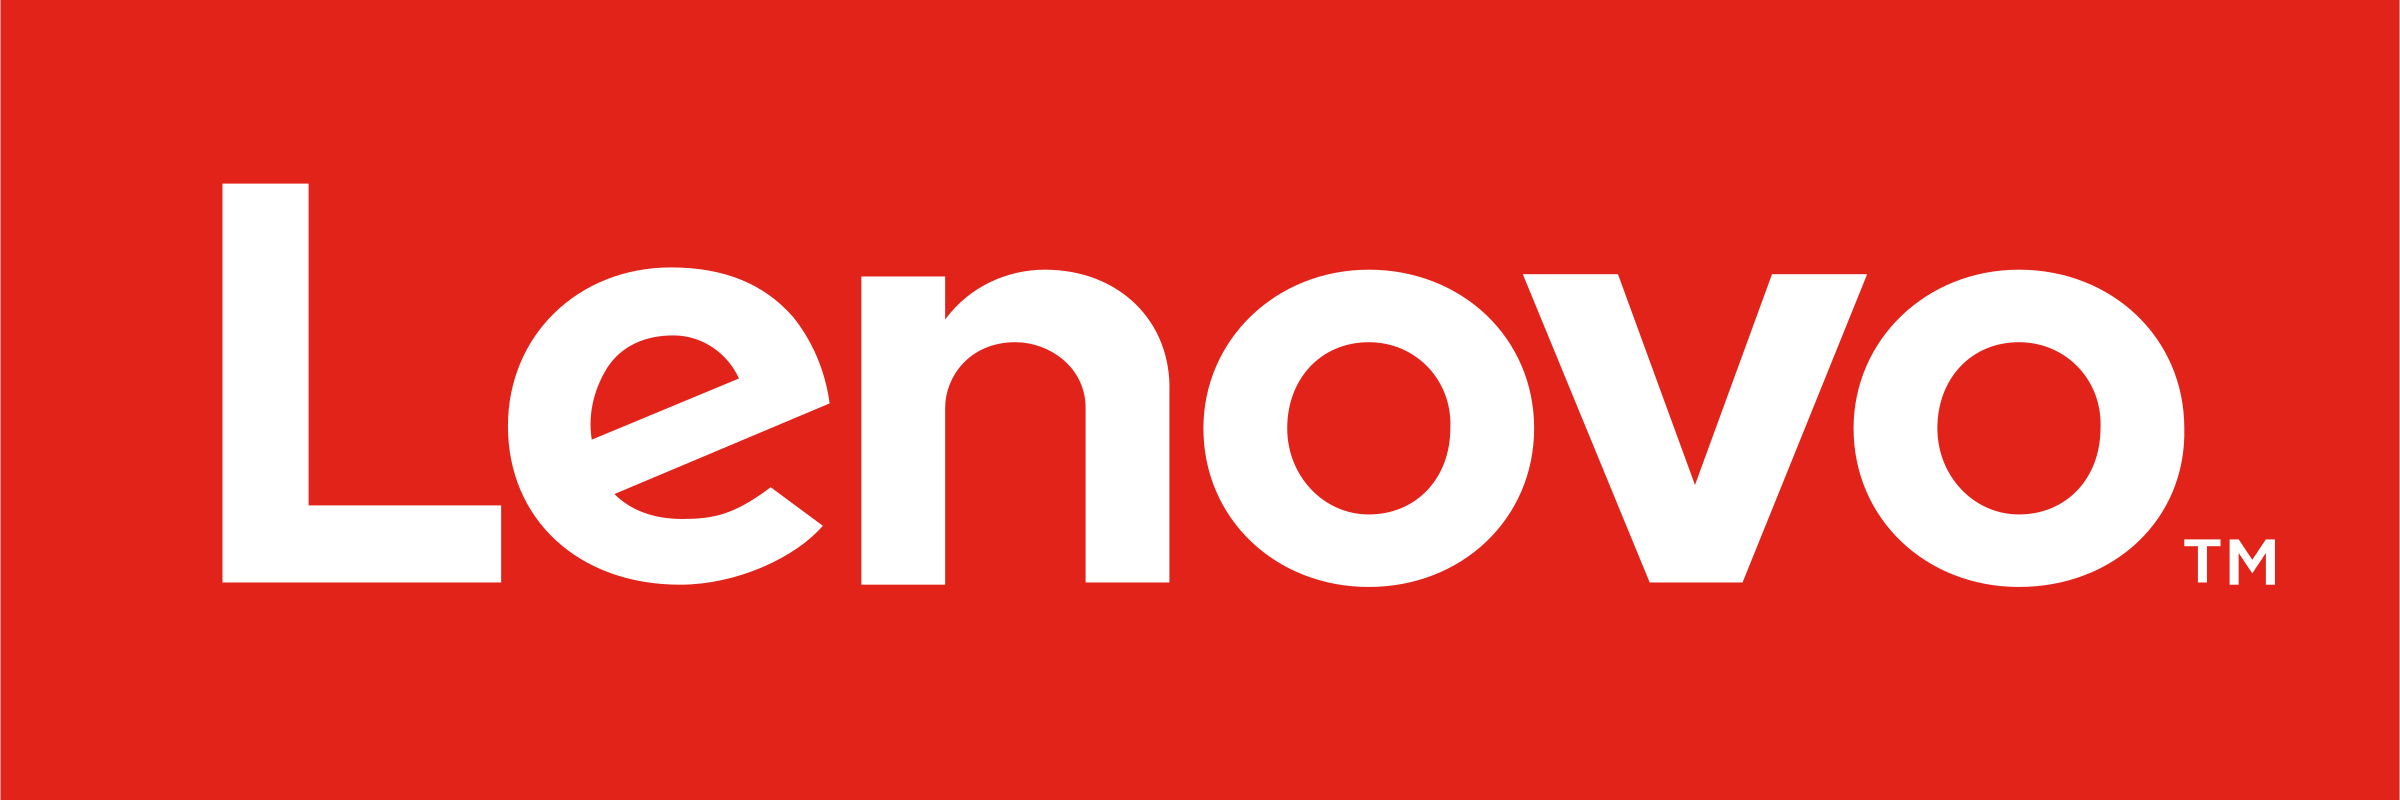 lenovo-es-logo